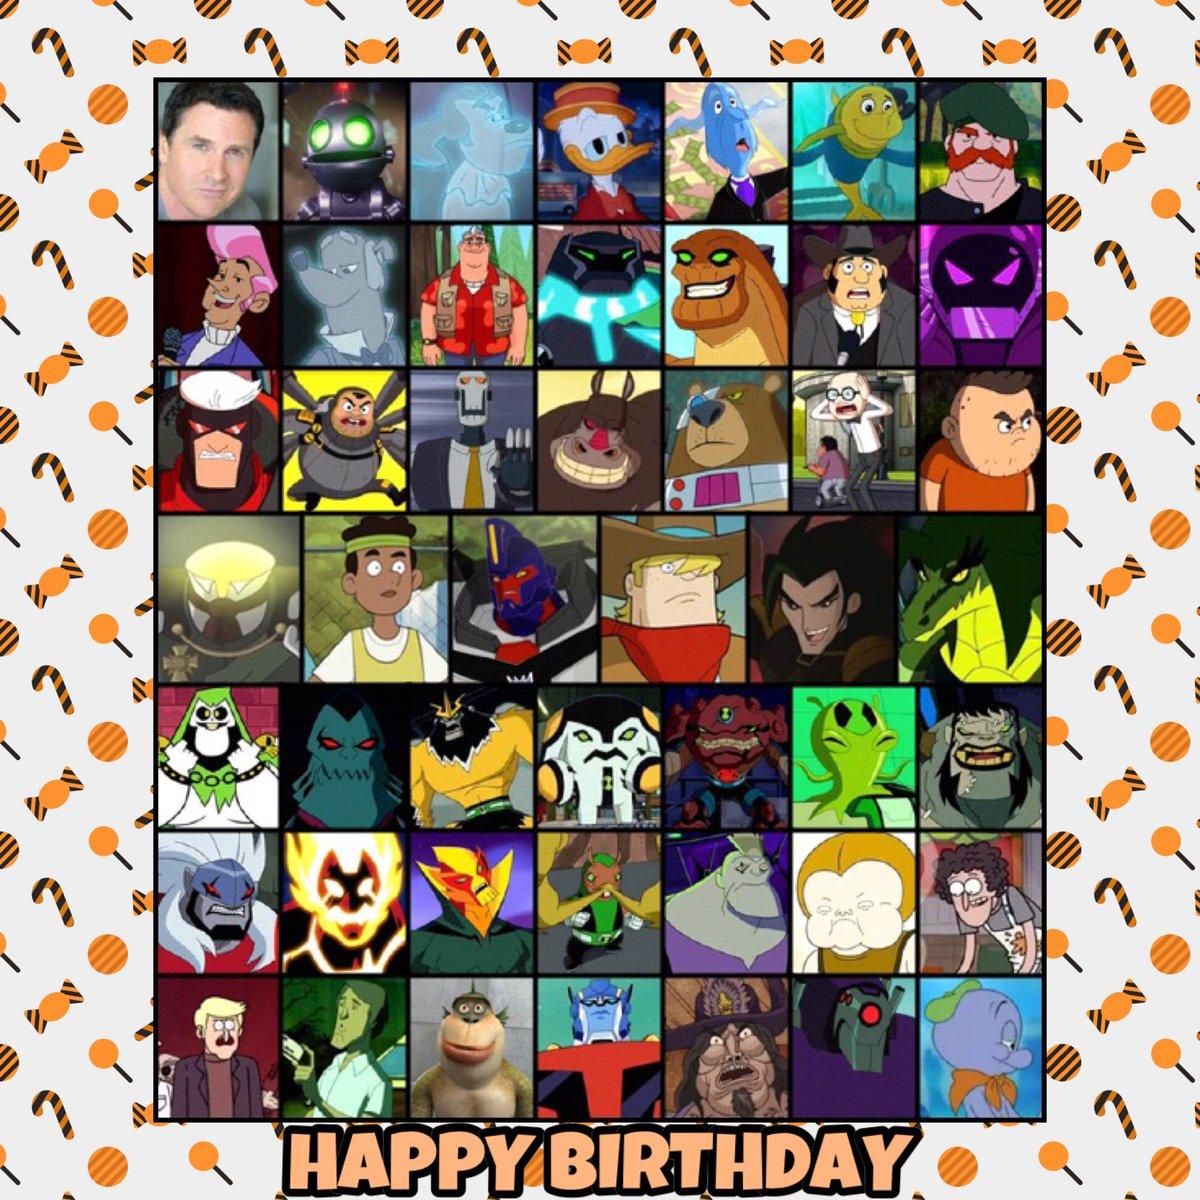 Happy B-Day to @dkayevo  🎊💯🙌🏼🎉🥳🎁🎂🎈#actors #happybirthday #celebration #Ben10 #Transformers #TomandJerryTales #GreenEggsAndHam #ScoobyDoo #DavidKaye https://t.co/eYRkeuy7VX